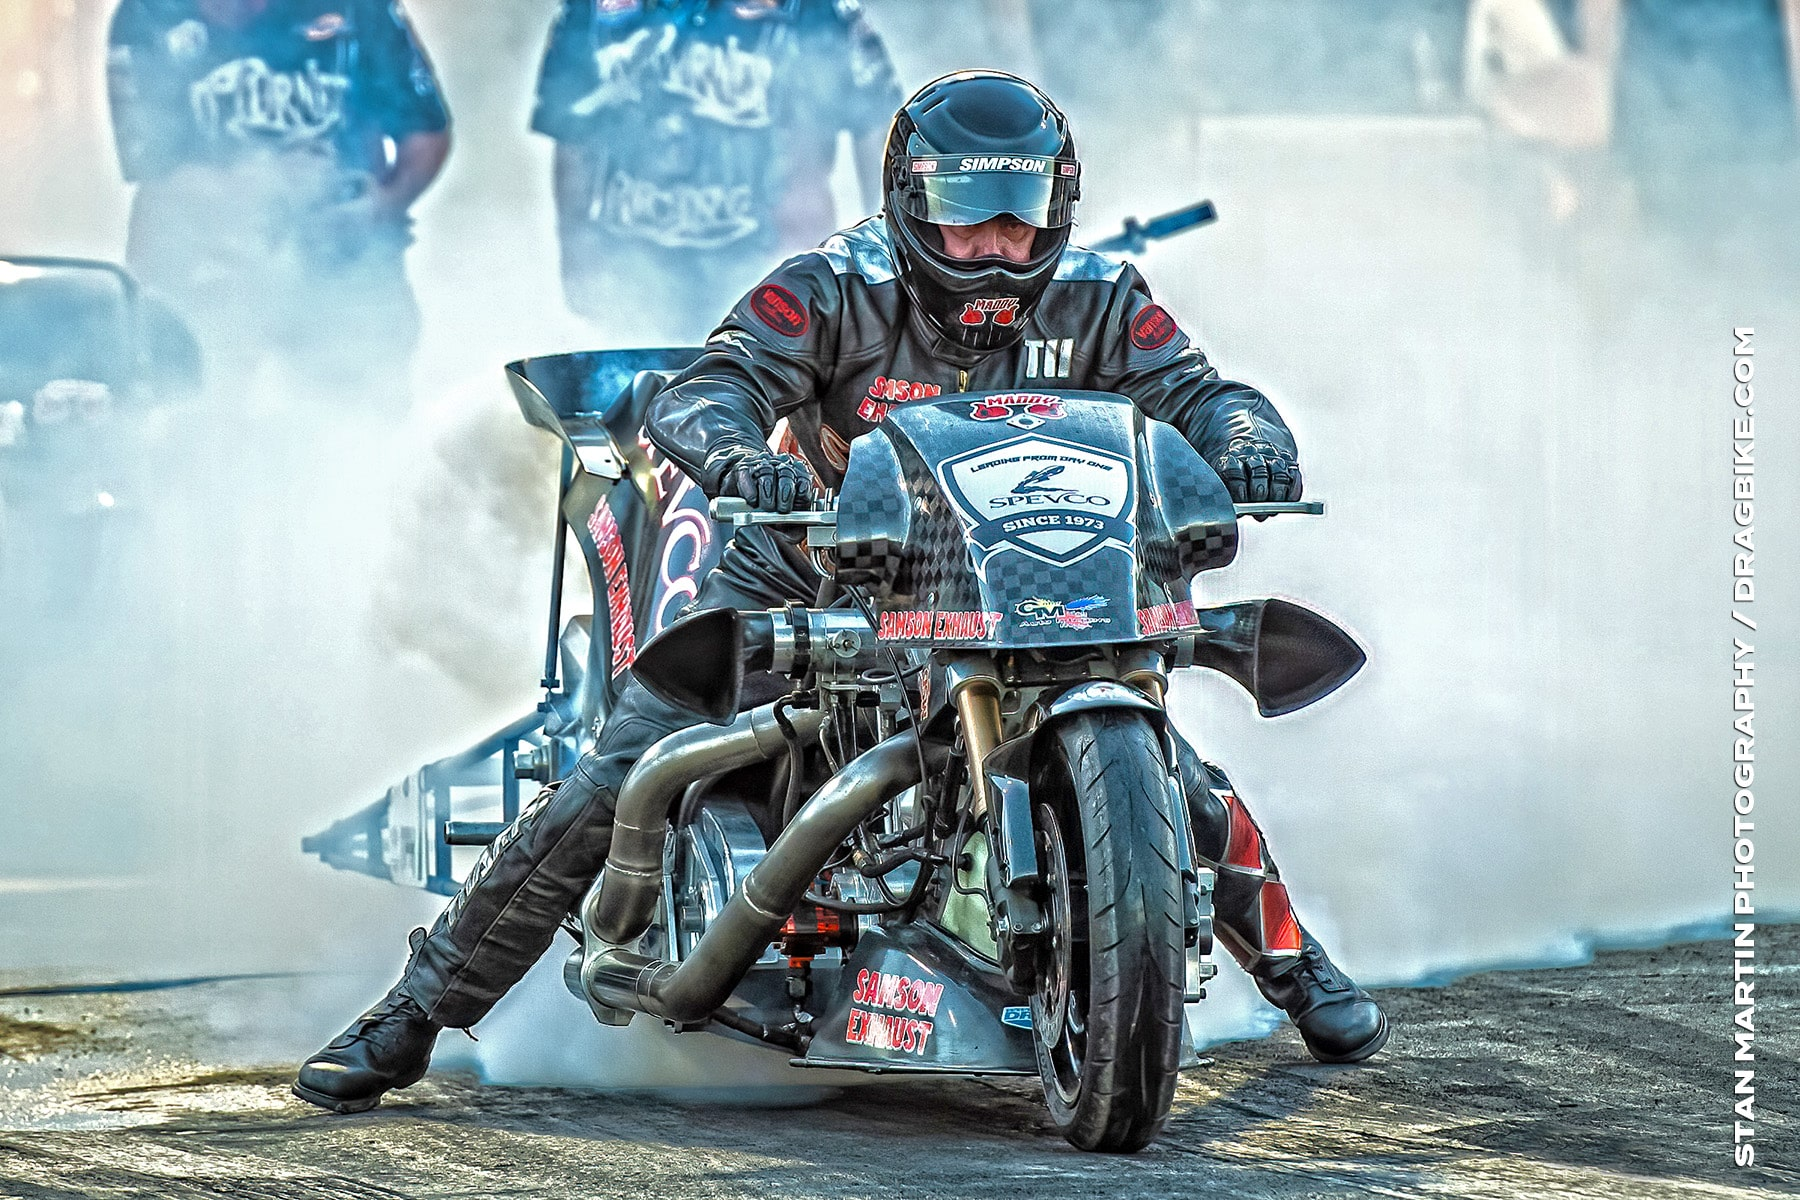 NHRA Top Fuel HarleyTii Tharpe - NHRA Top Fuel Harley